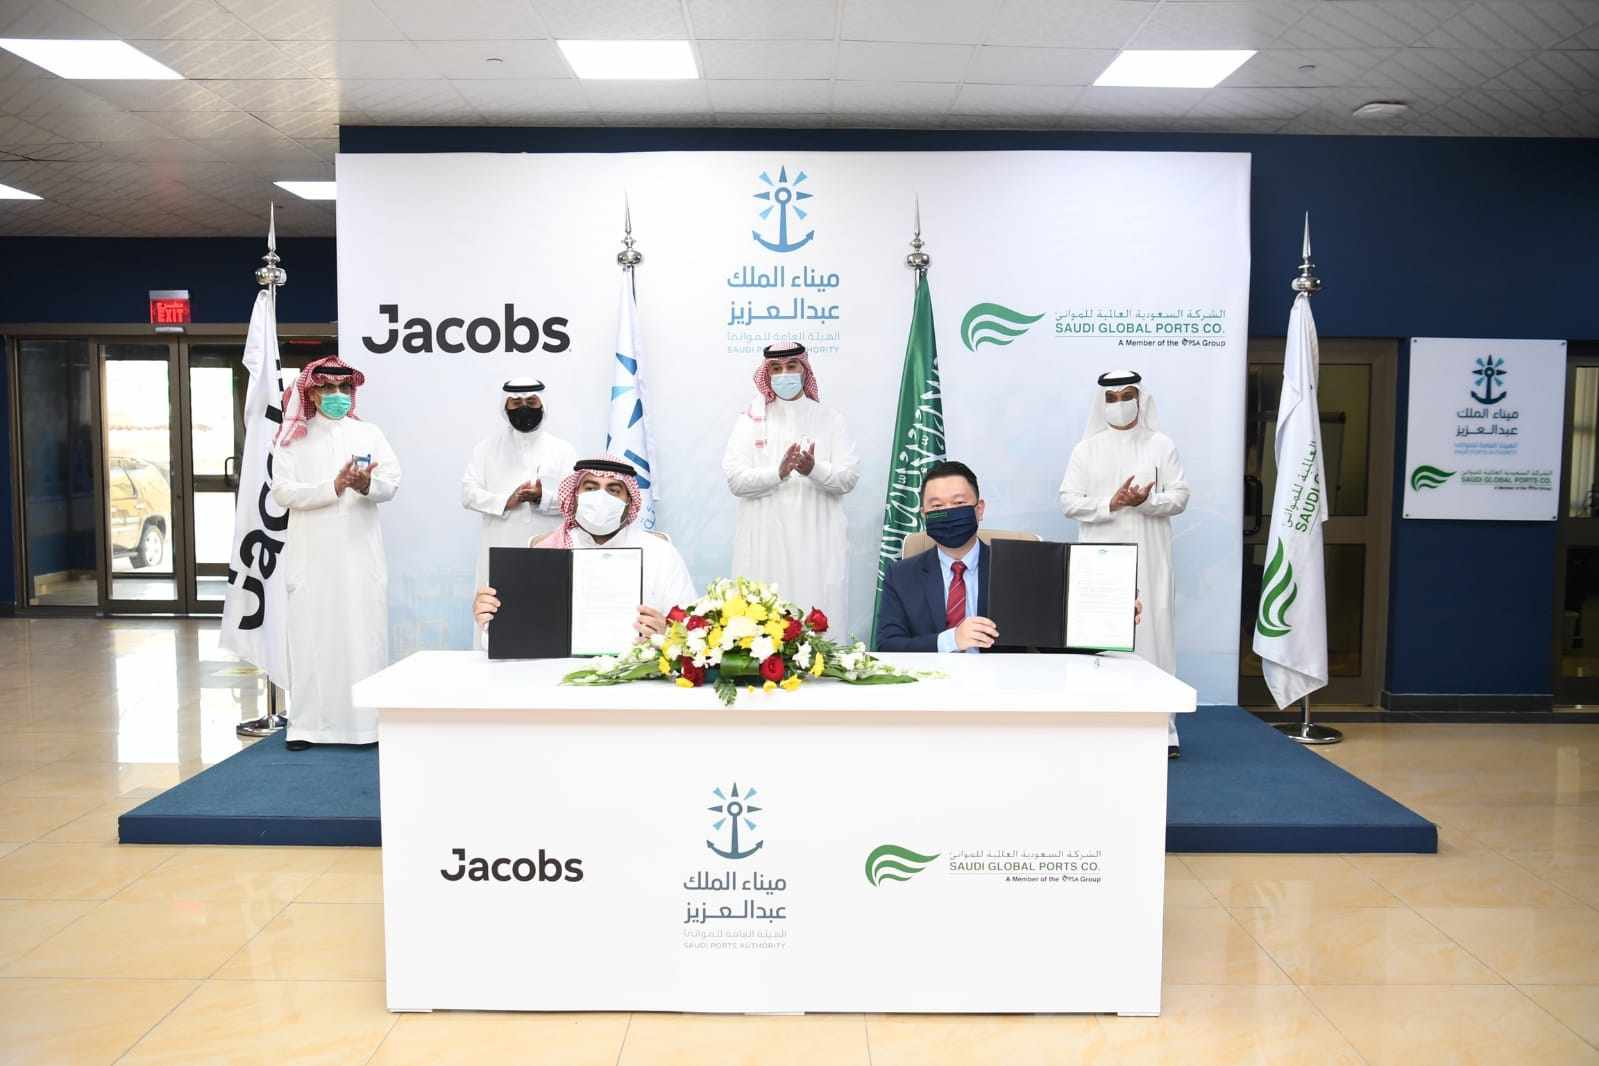 saudi global ports container terminals